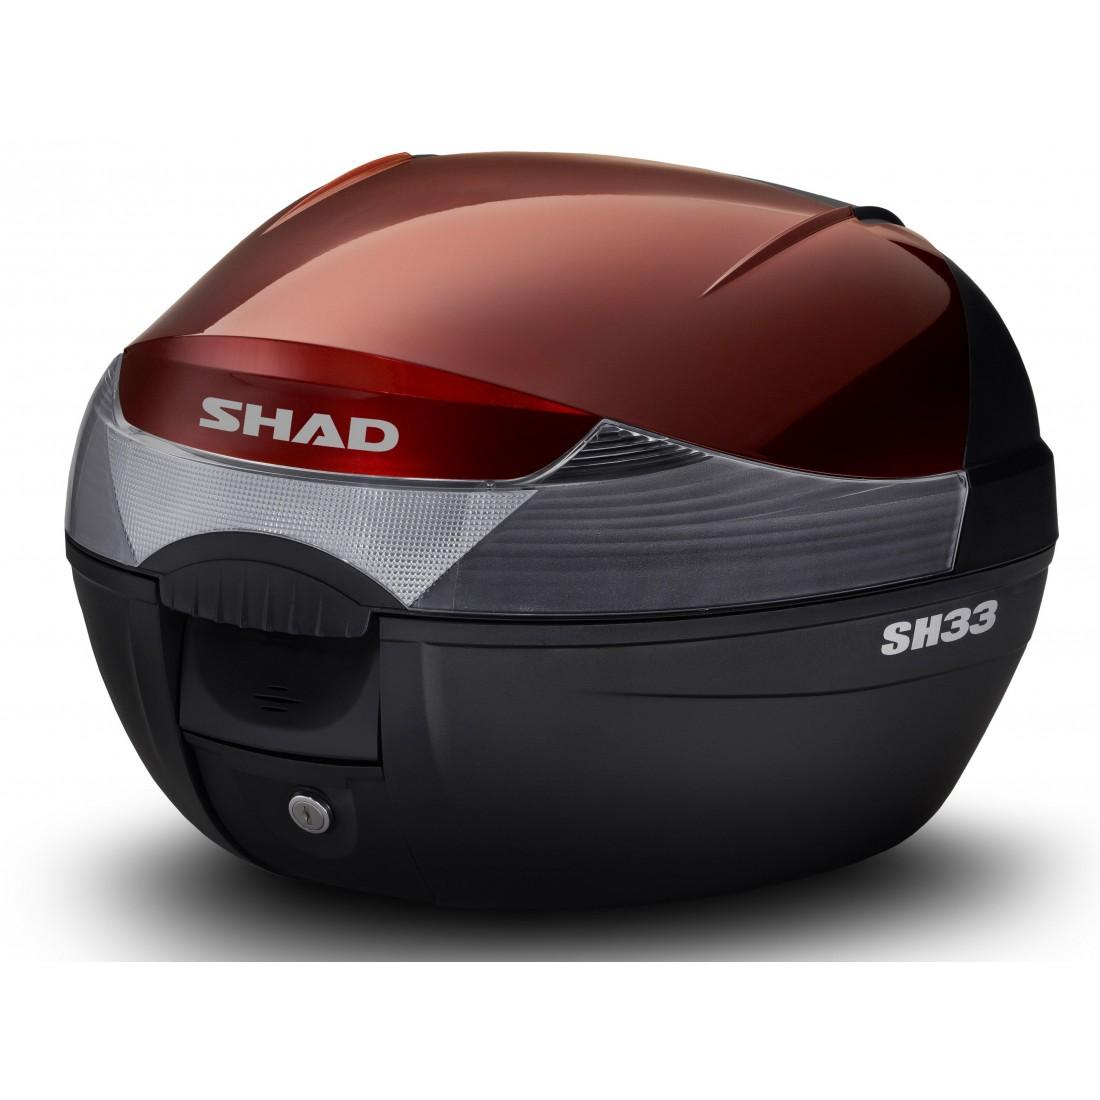 Tapa Baúl Shad SH33 33lt Rojo